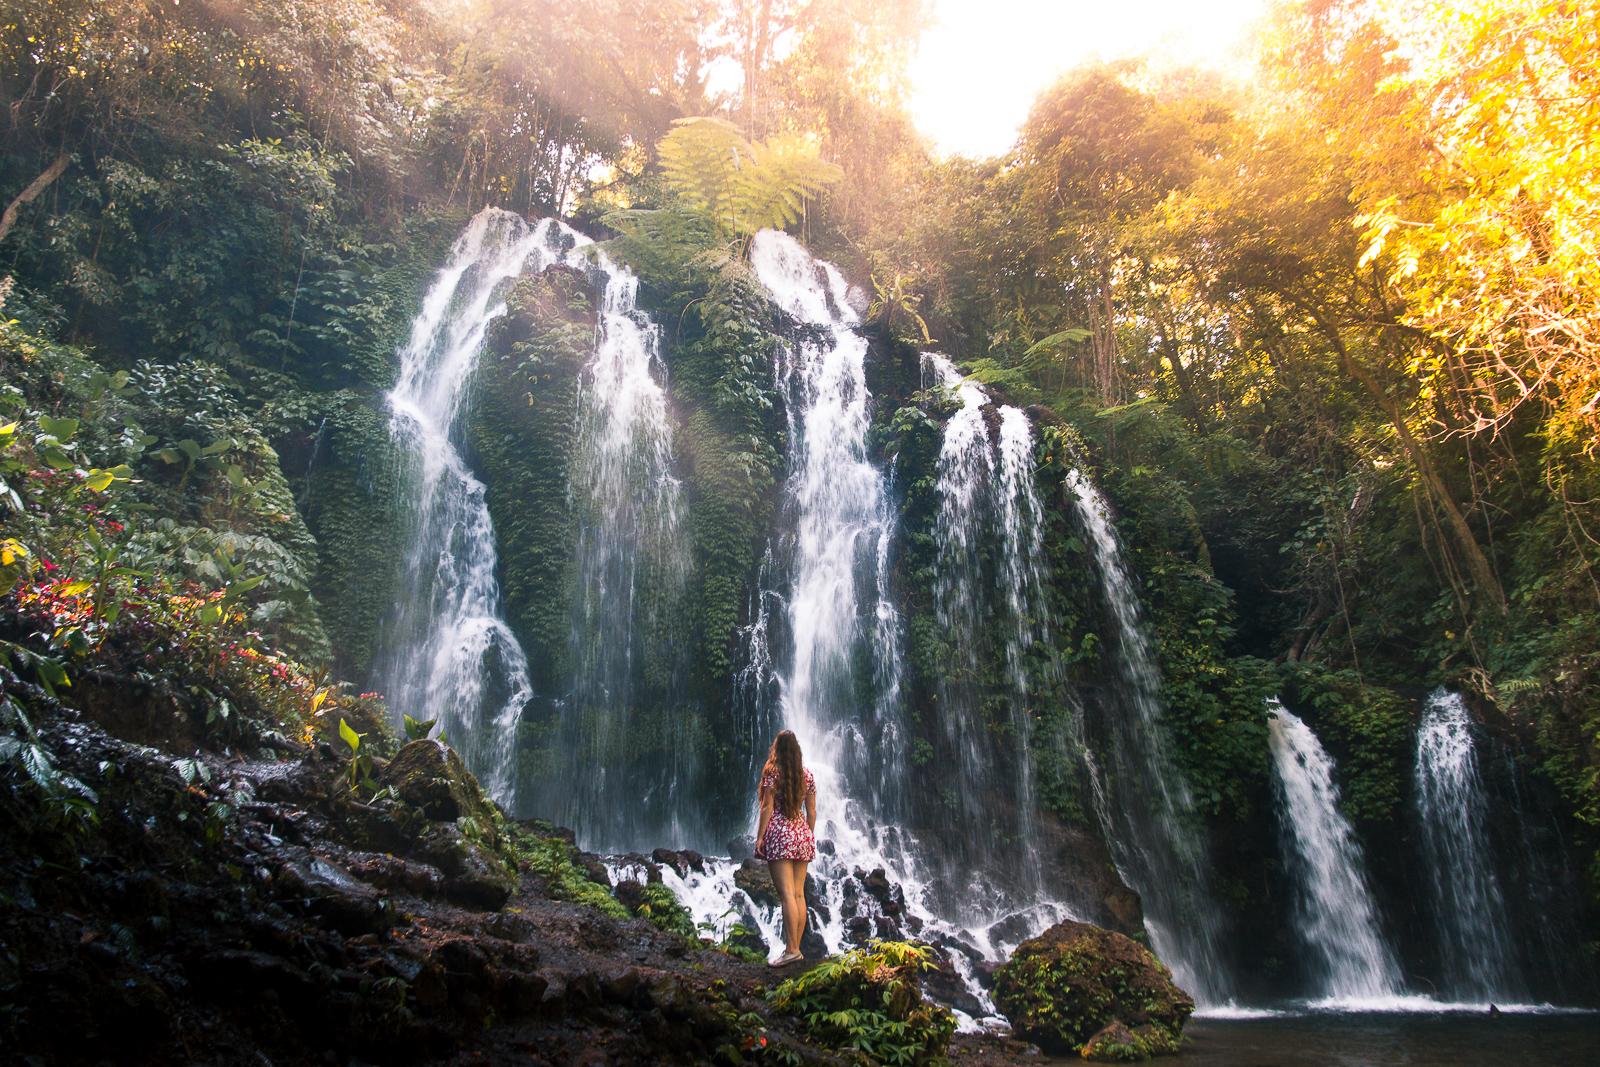 The Banyu Wana Amertha Waterfall – Bali's Best Kept Secret